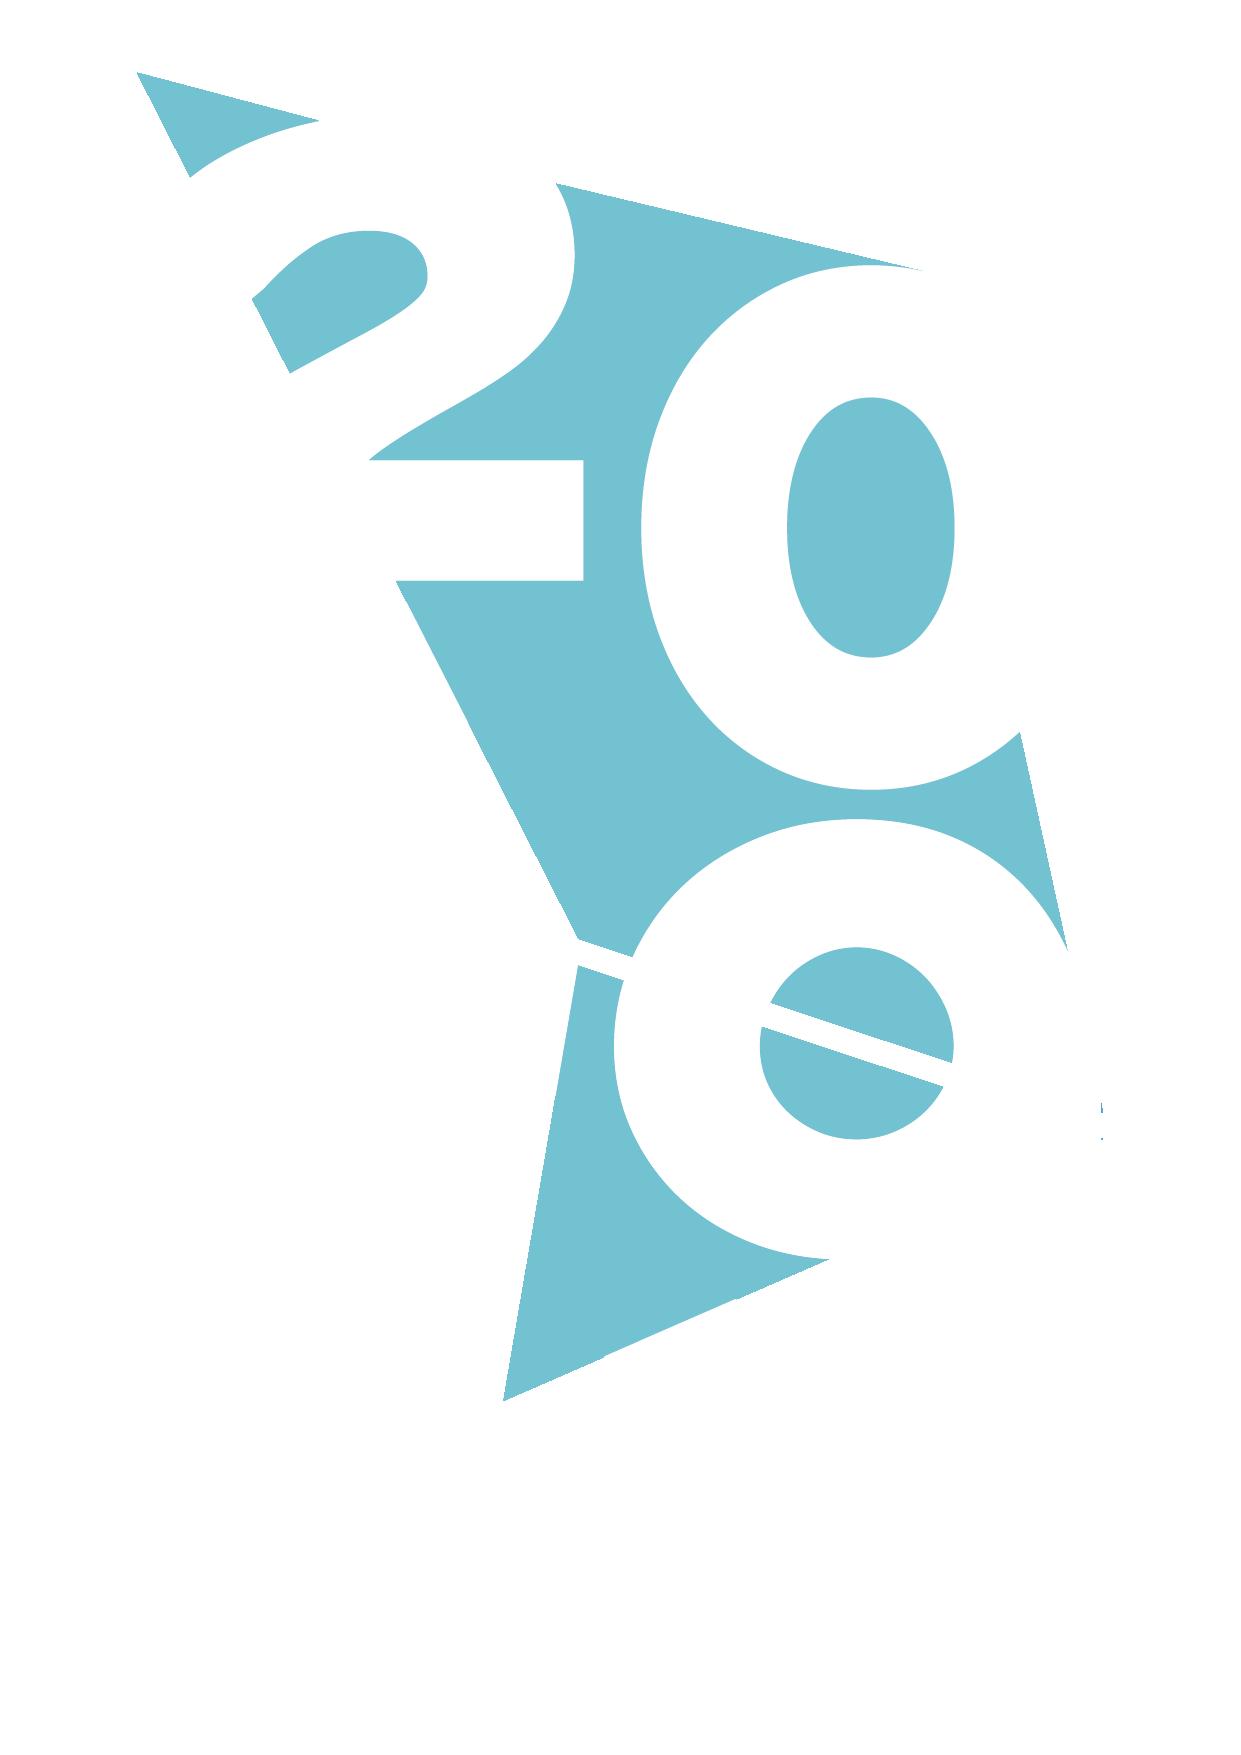 2019logo_logo4_whiteletters_bluefoot